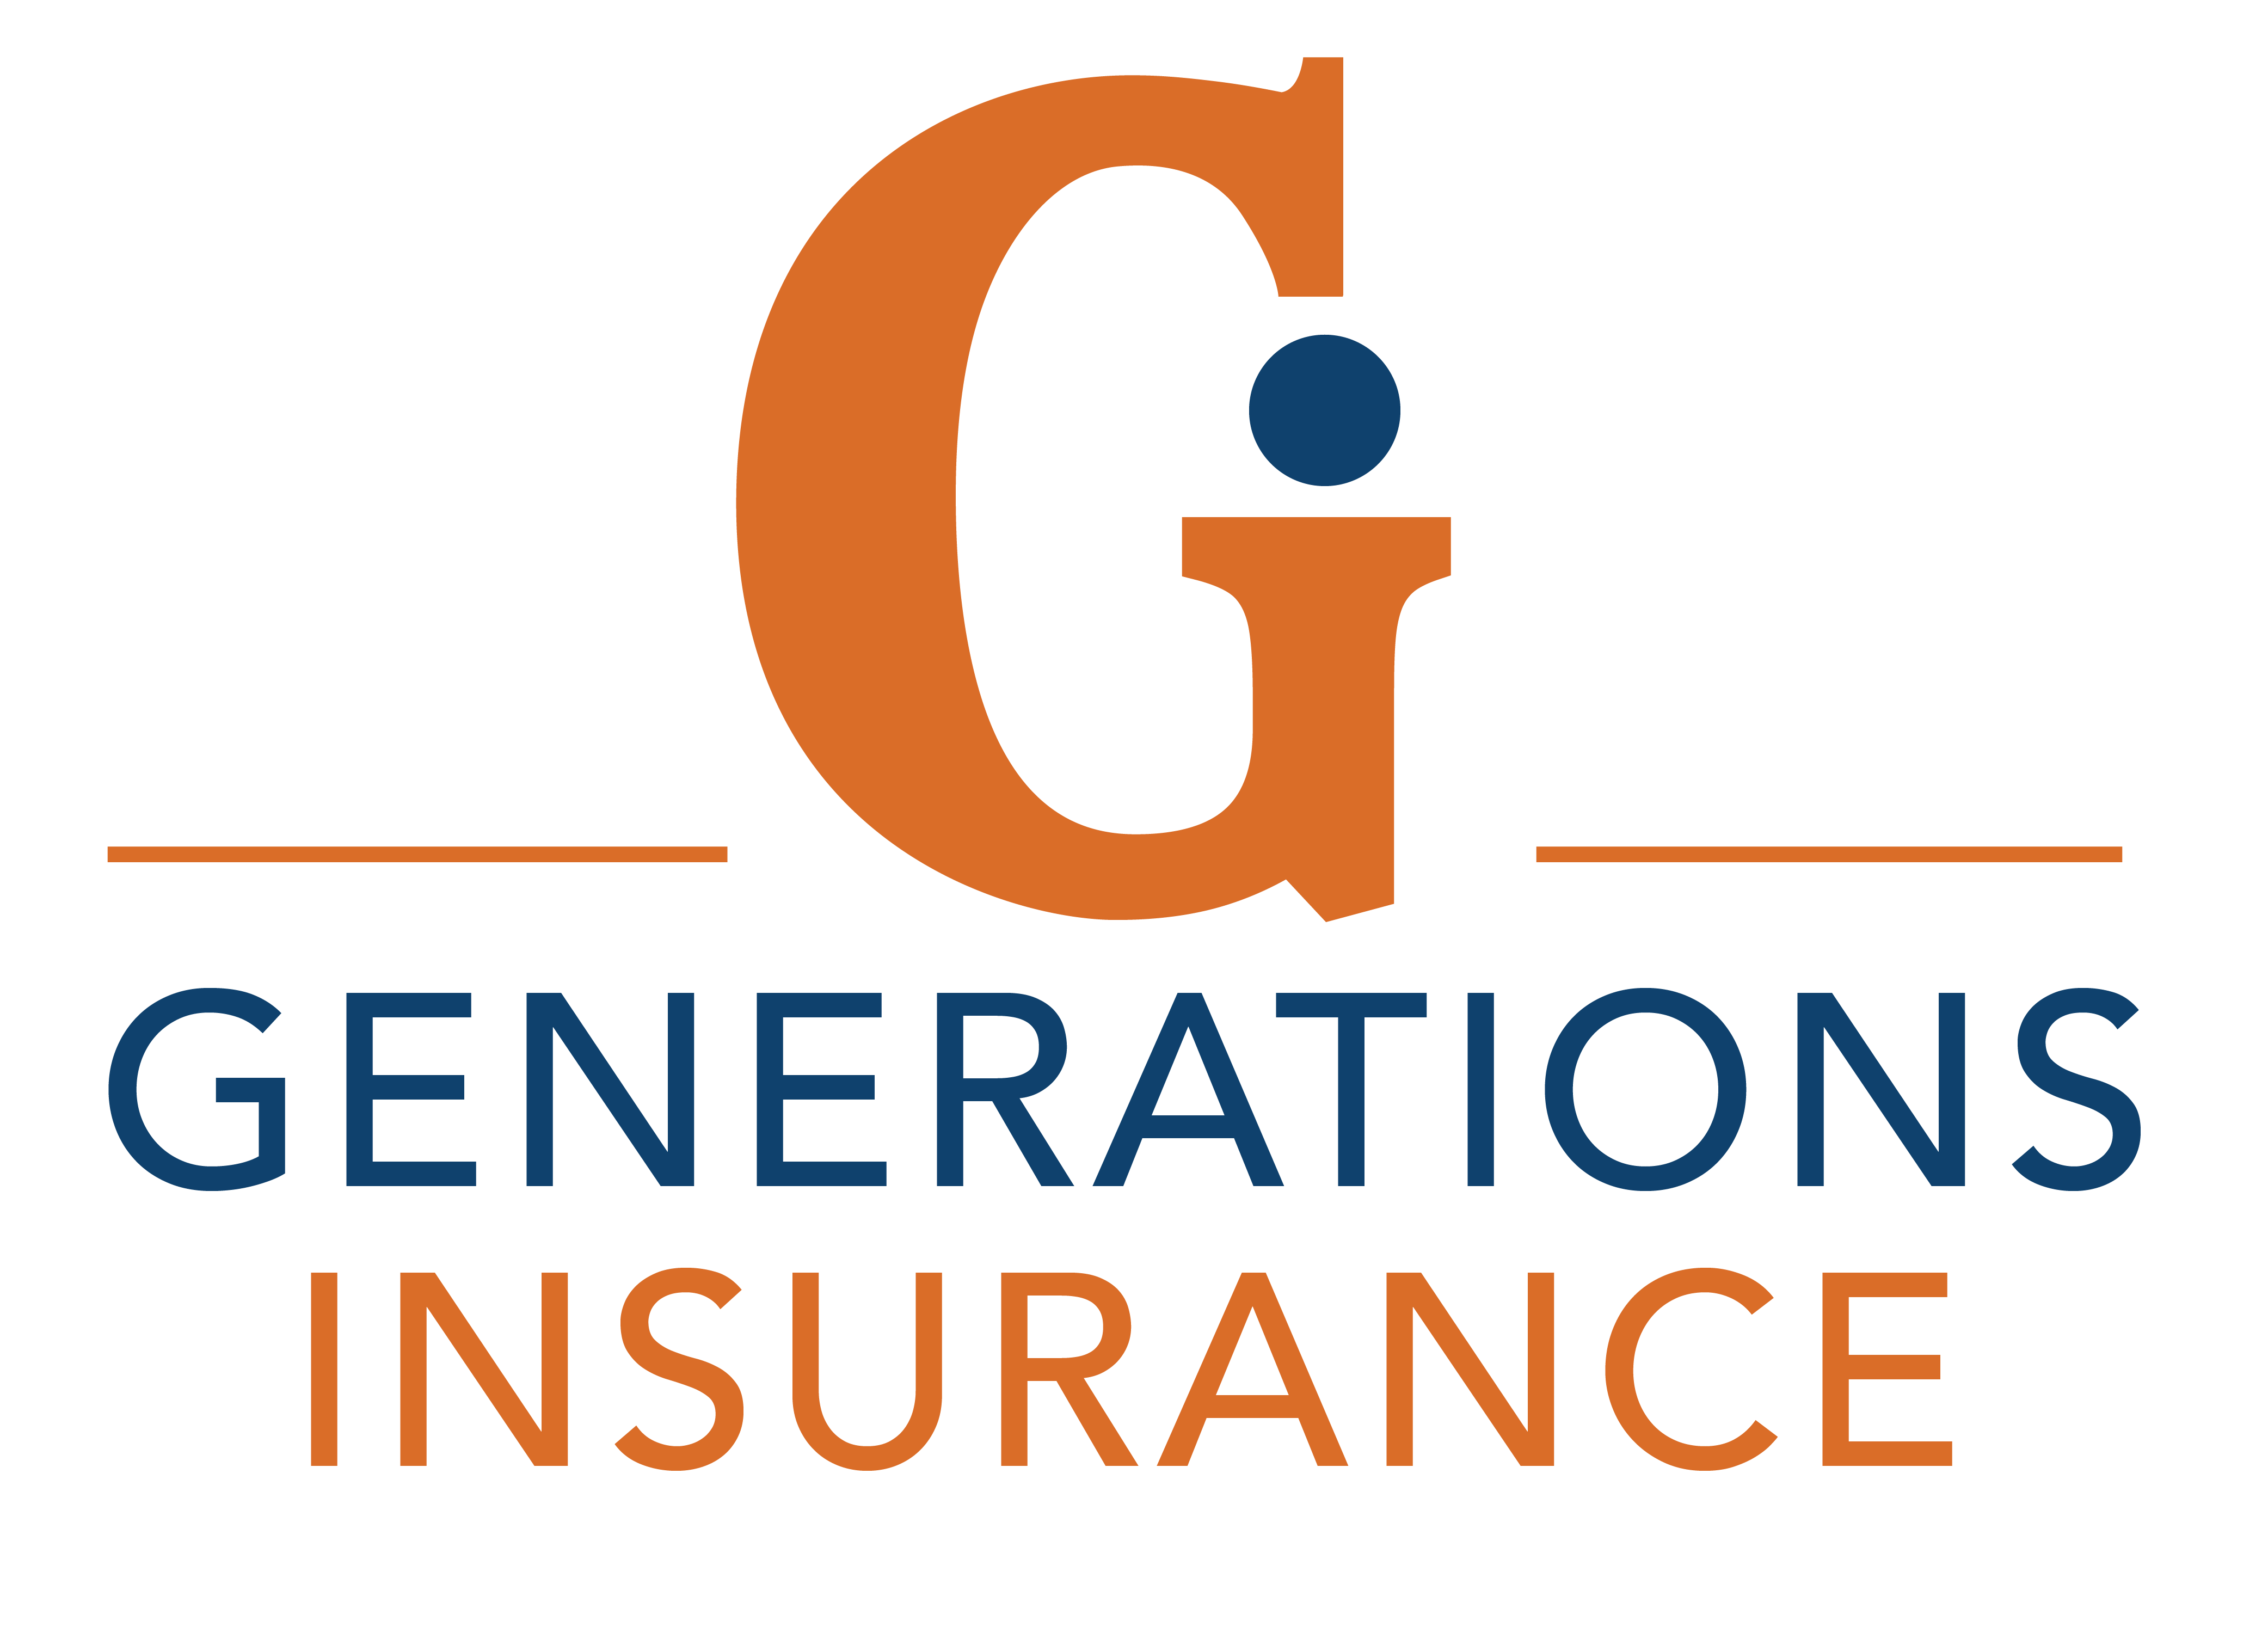 GenerationsLogo-01